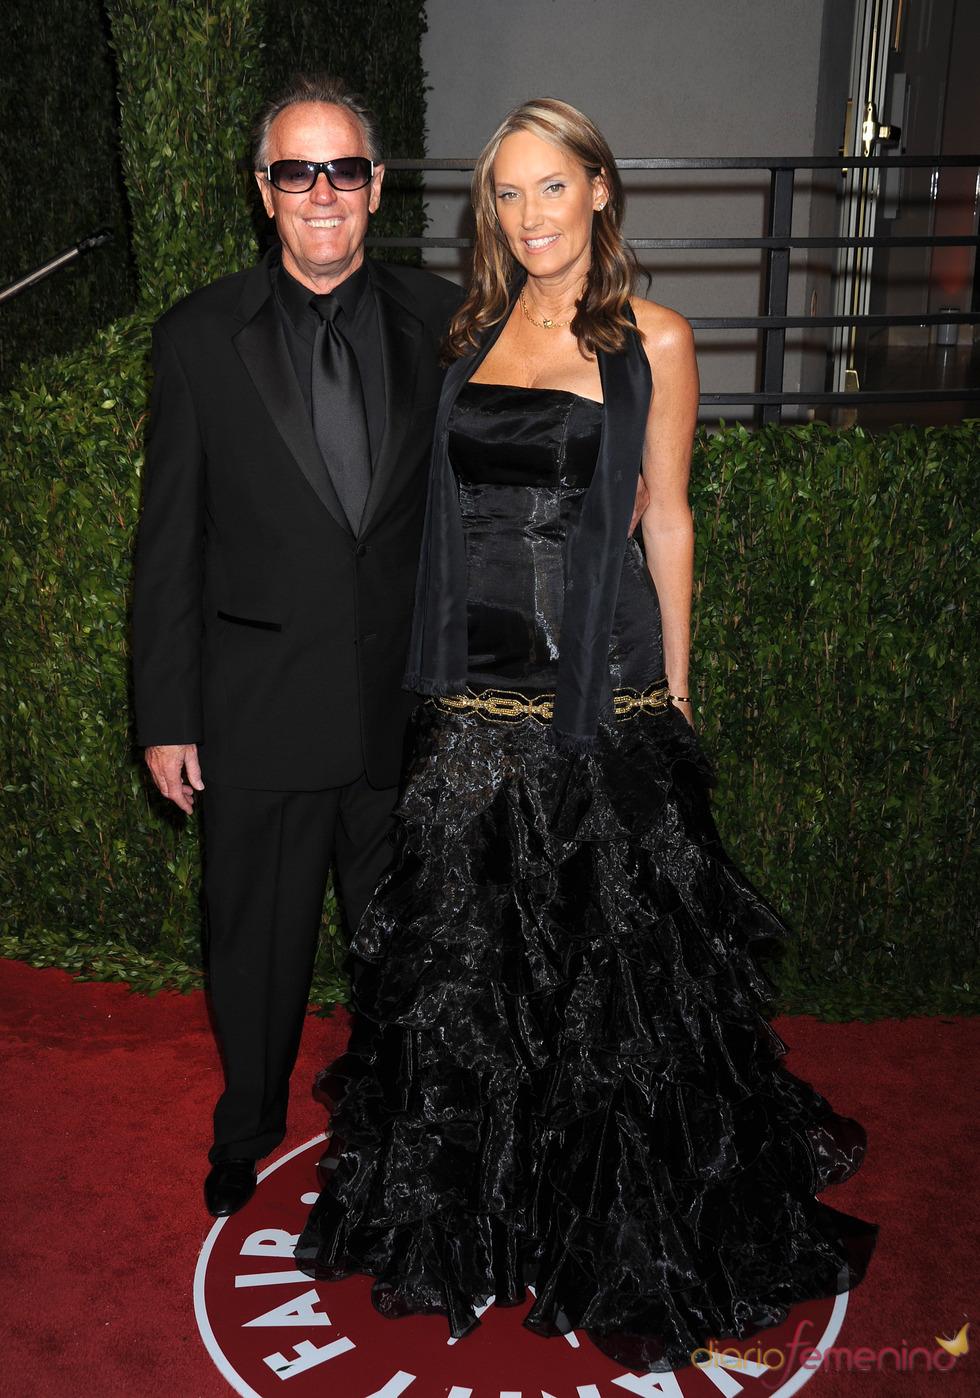 Peter Fonda, en la fiesta Vanity Fair Oscar 2010